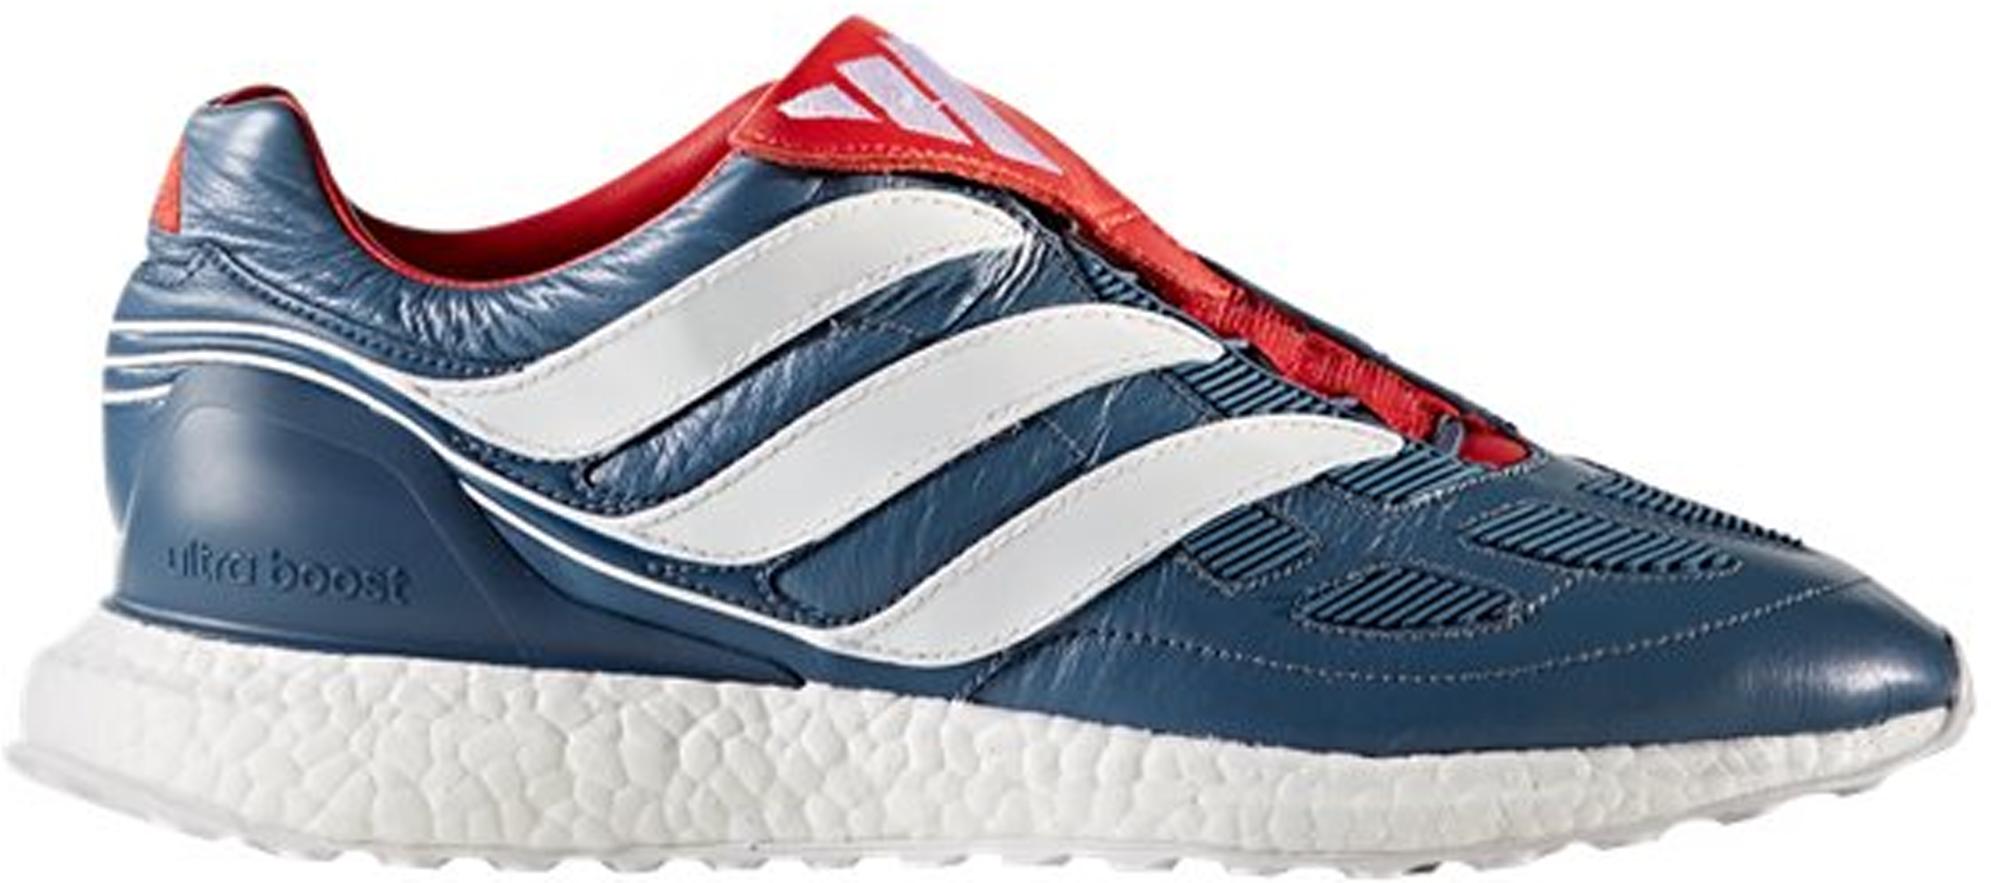 adidas Predator Ultra Boost Blue White Red